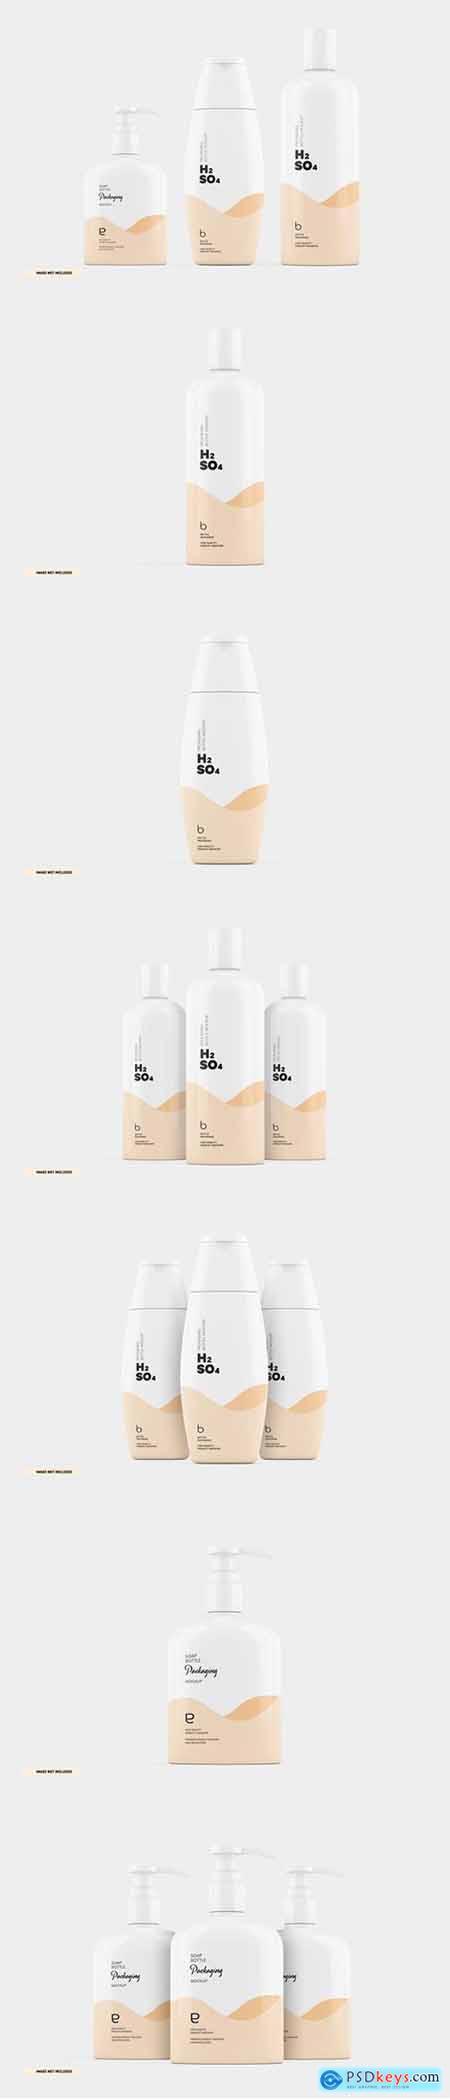 Cosmetics bottle shampoo soap packaging mockup